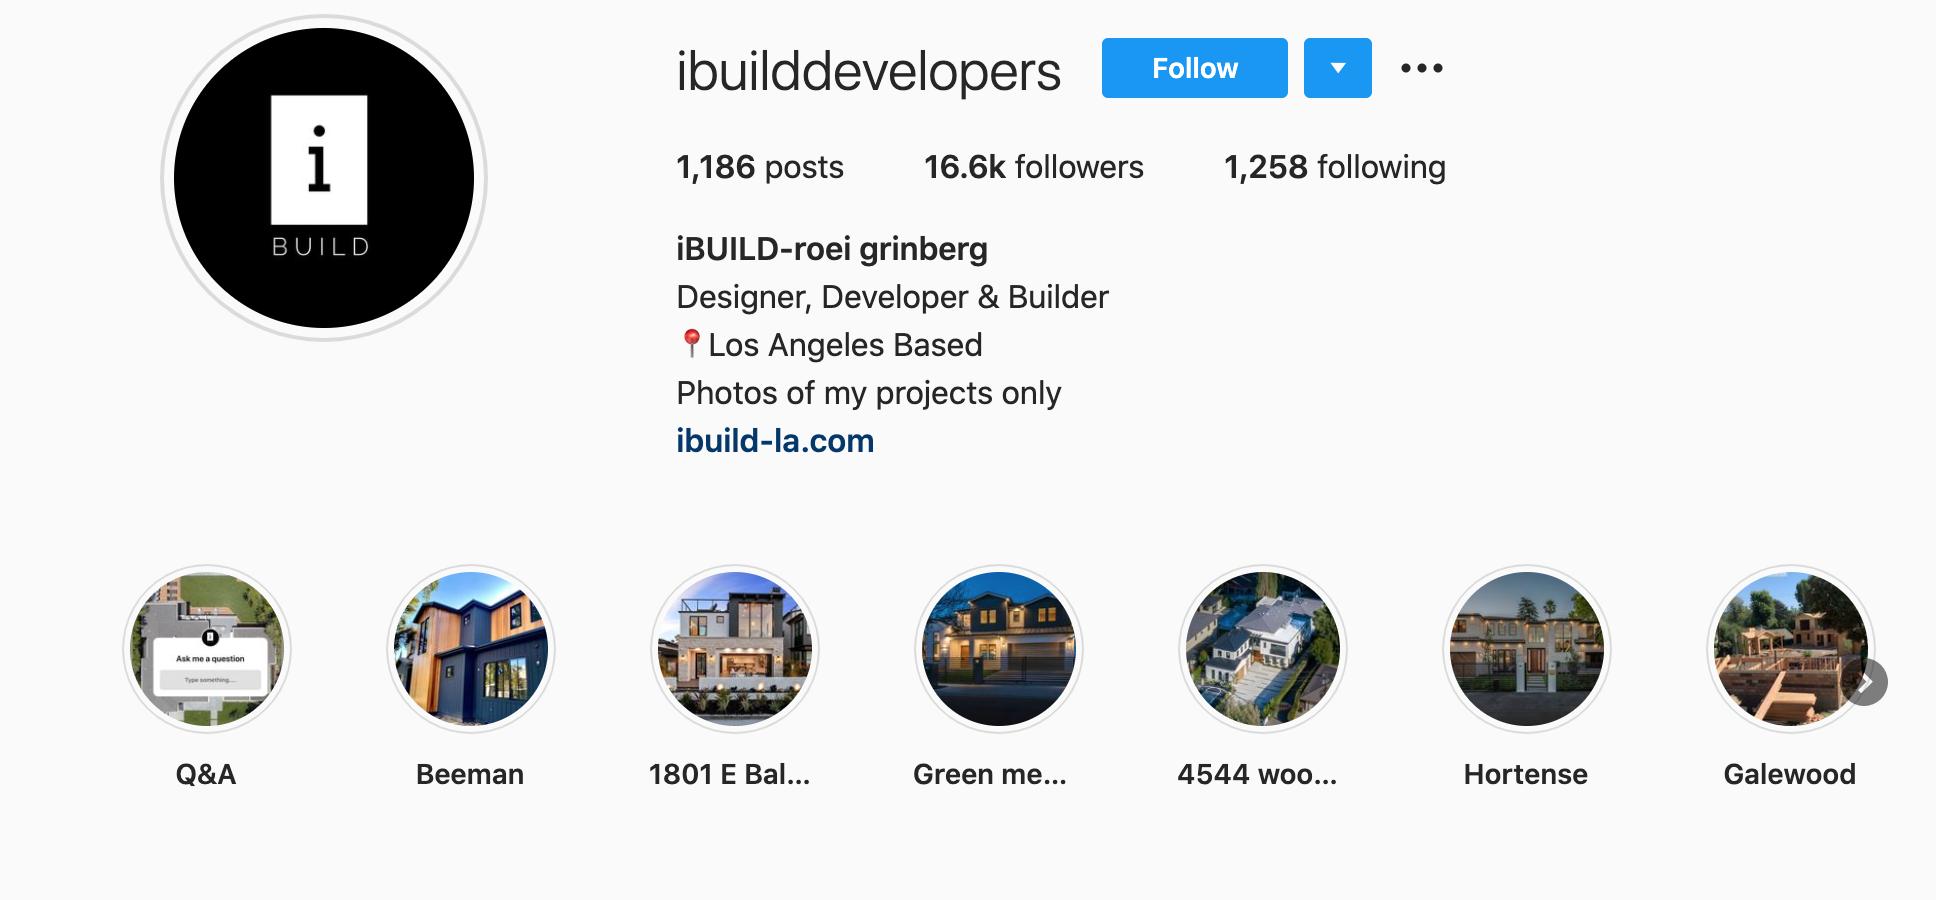 ibuild-roei-grinberg-ibuilddevelopers-instagram-profile